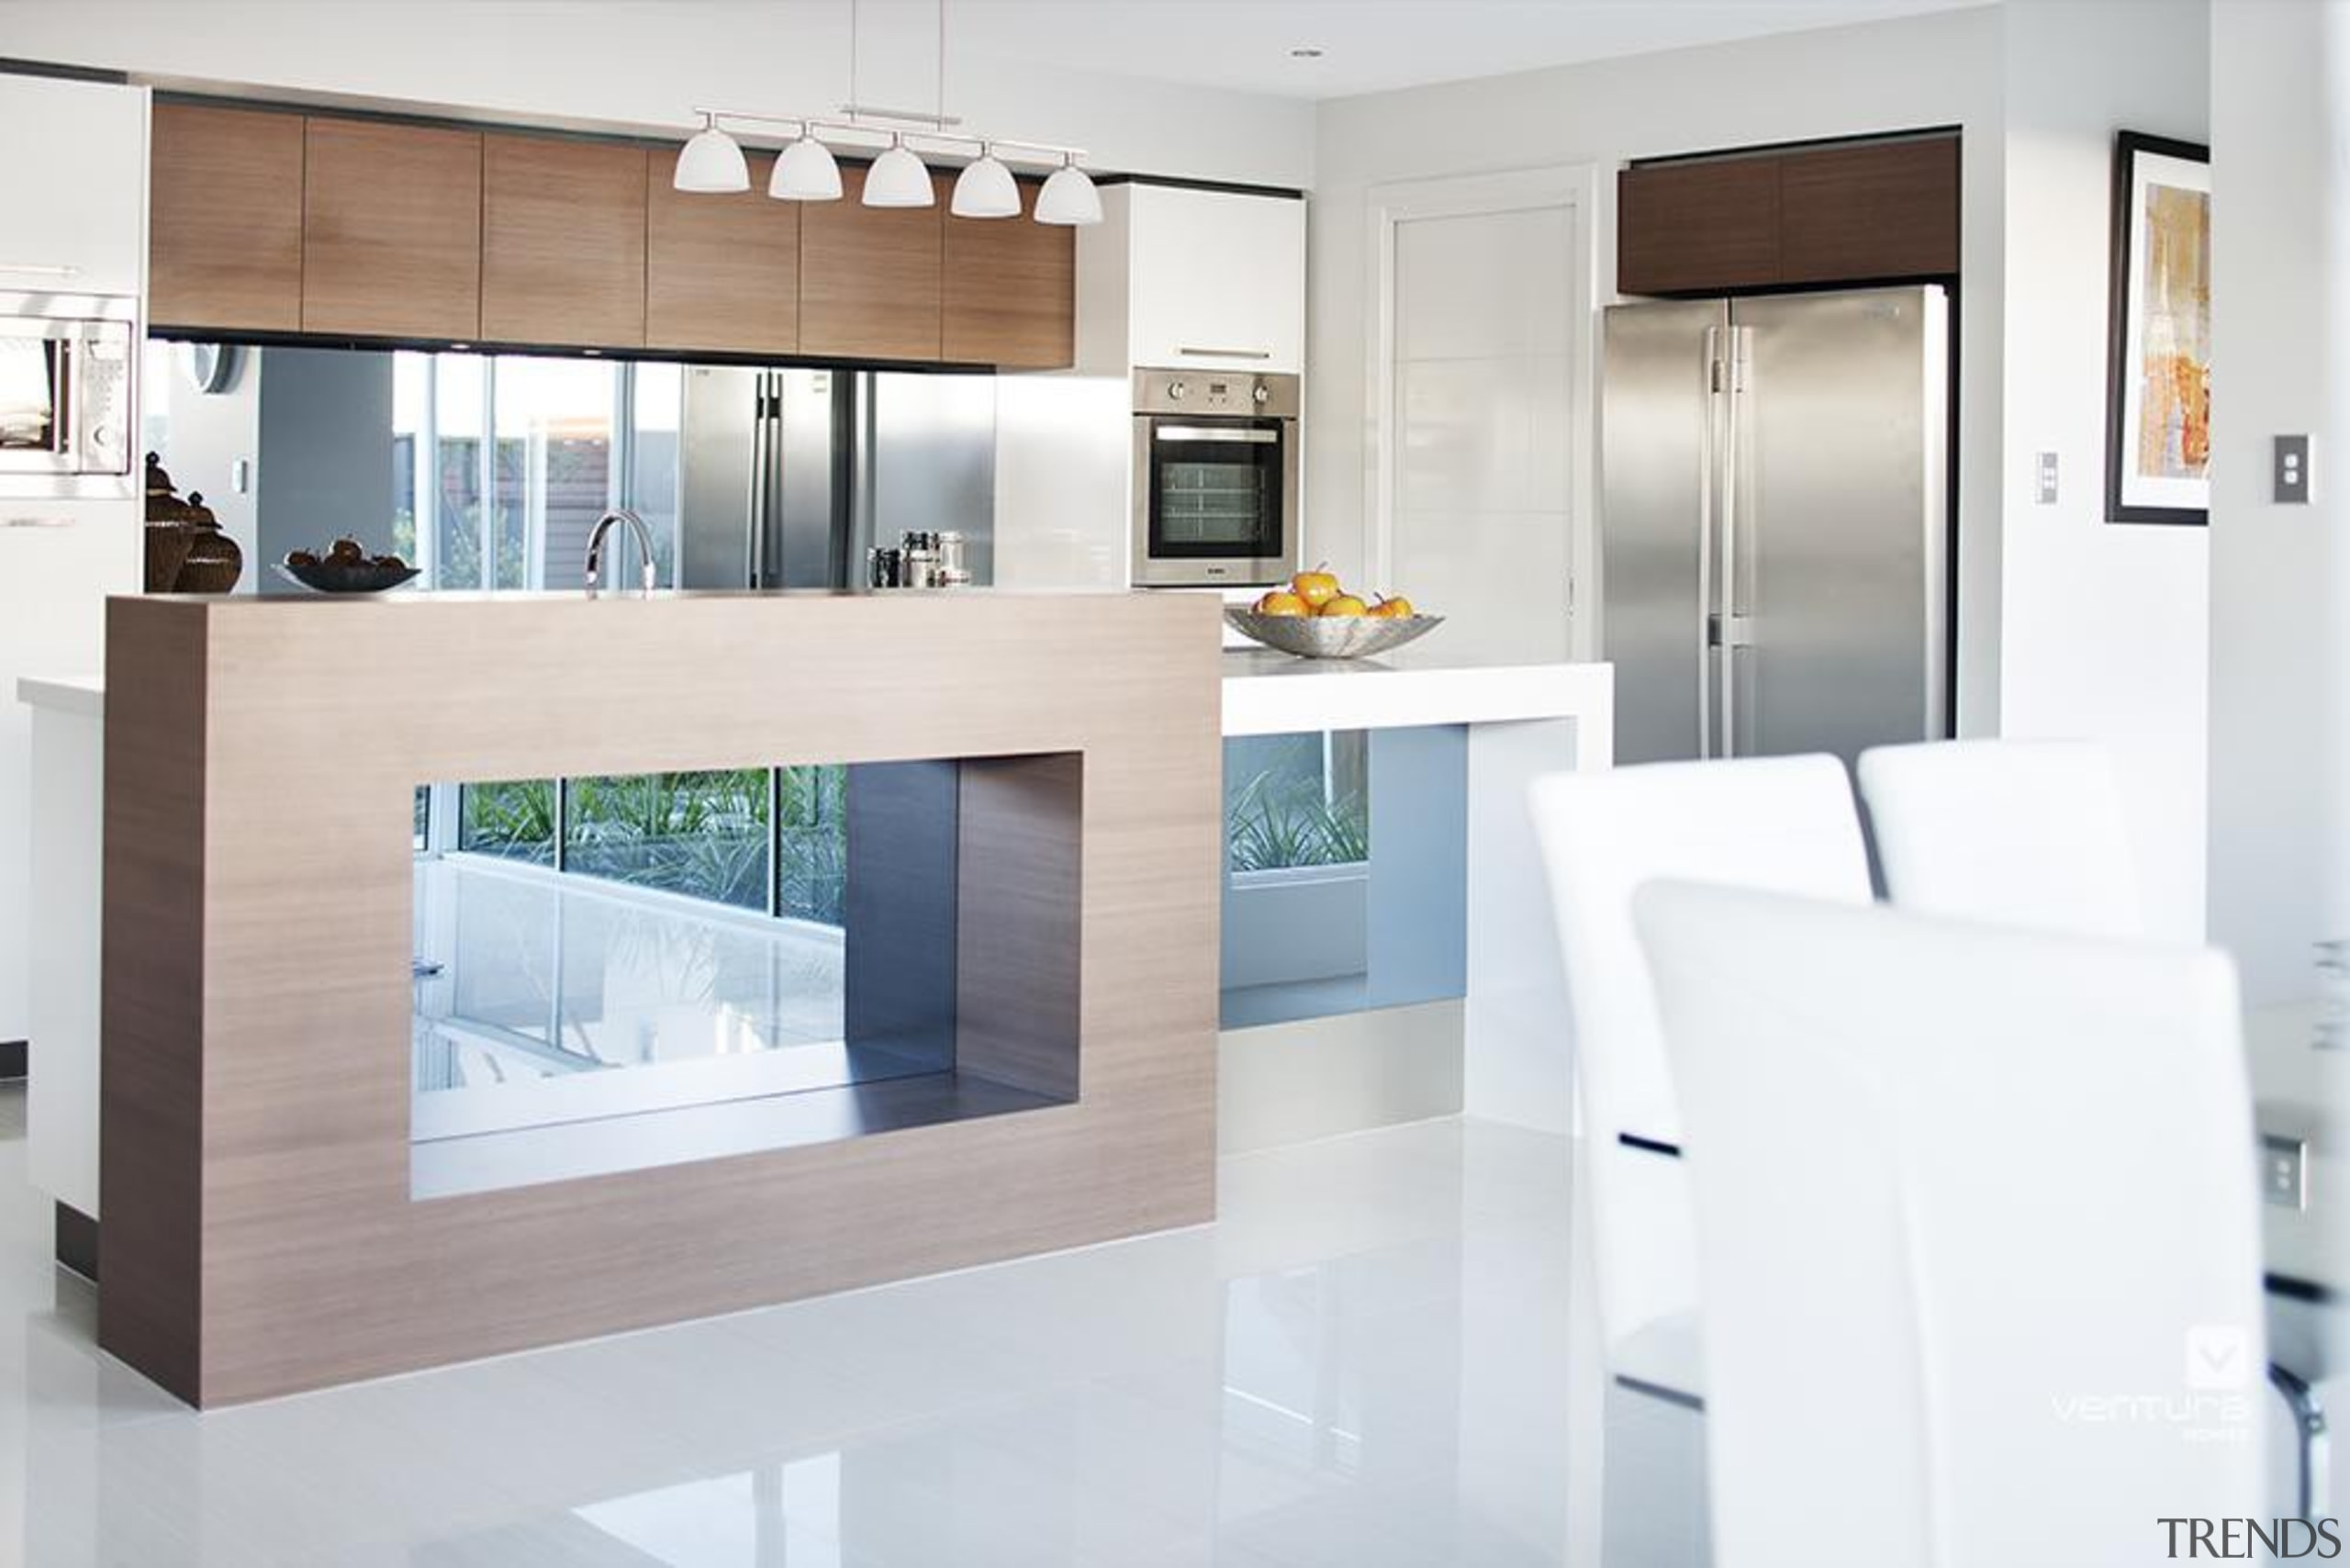 Kitchen design. - The Chianti Display Home - countertop, floor, interior design, kitchen, living room, product design, white